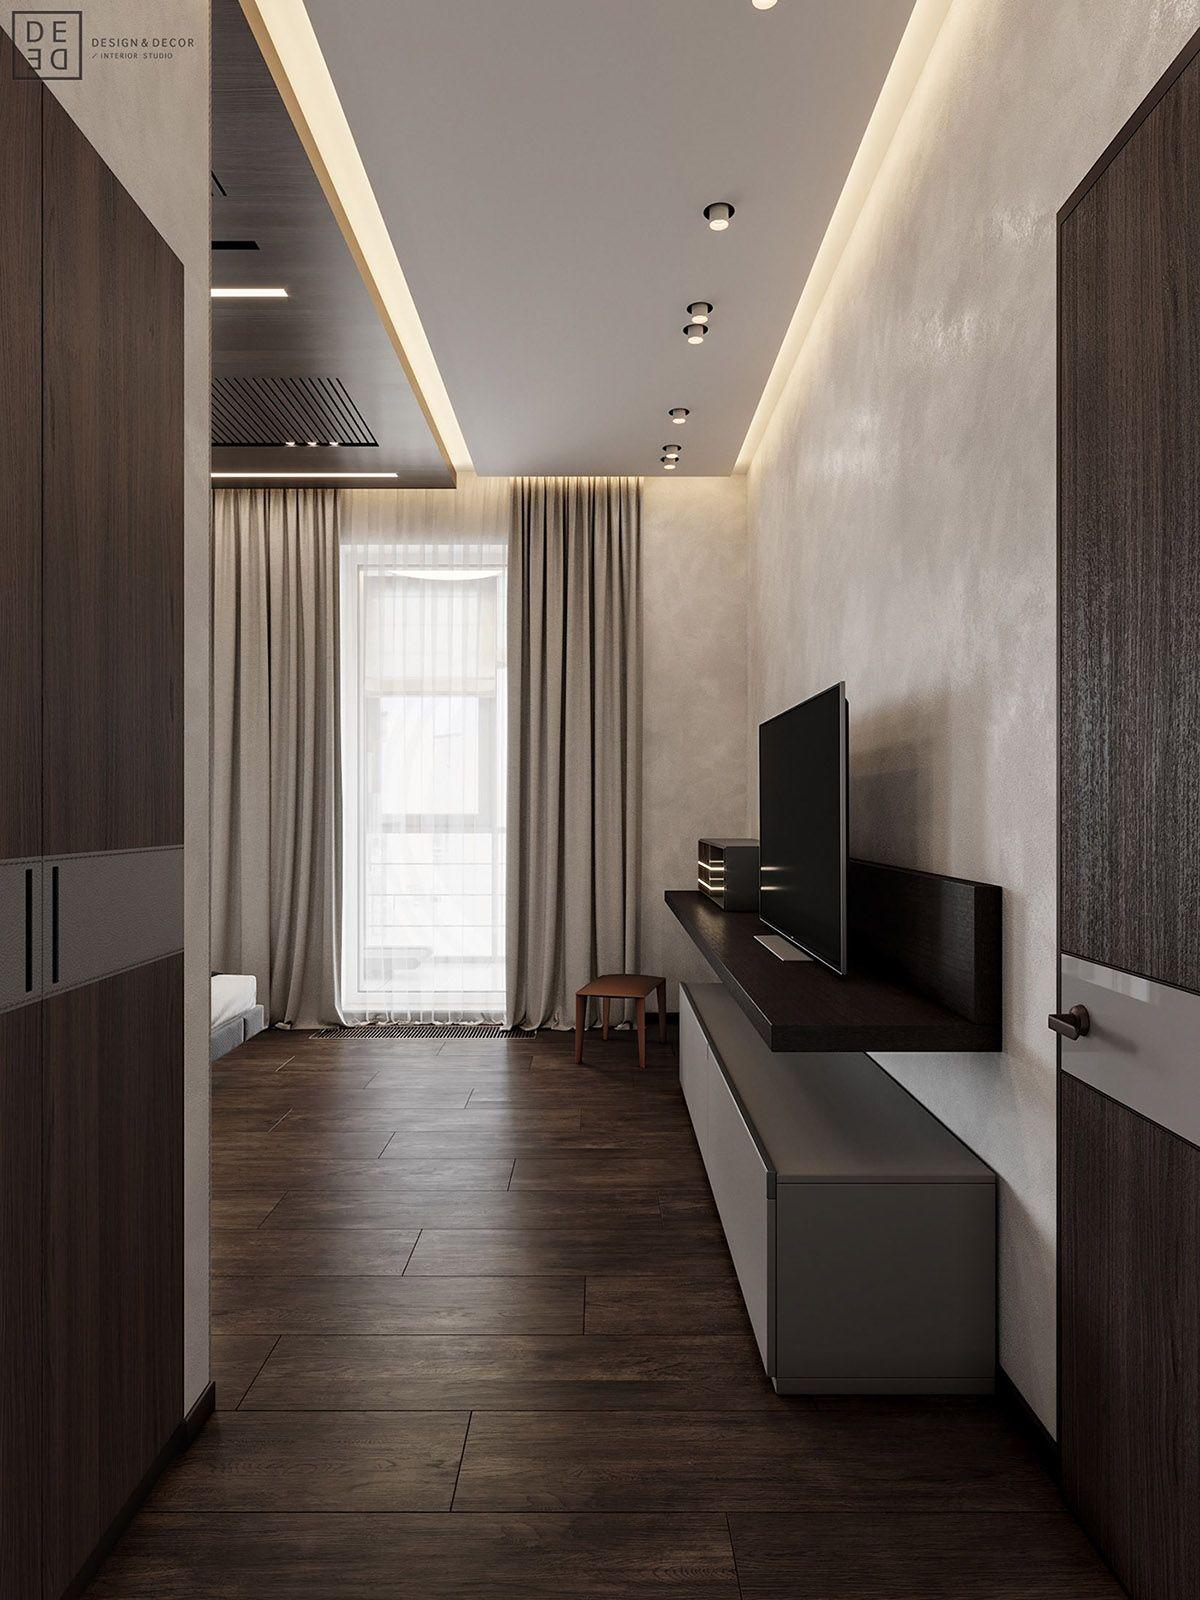 Luxurious Interior With Wood Slat Walls Floor design